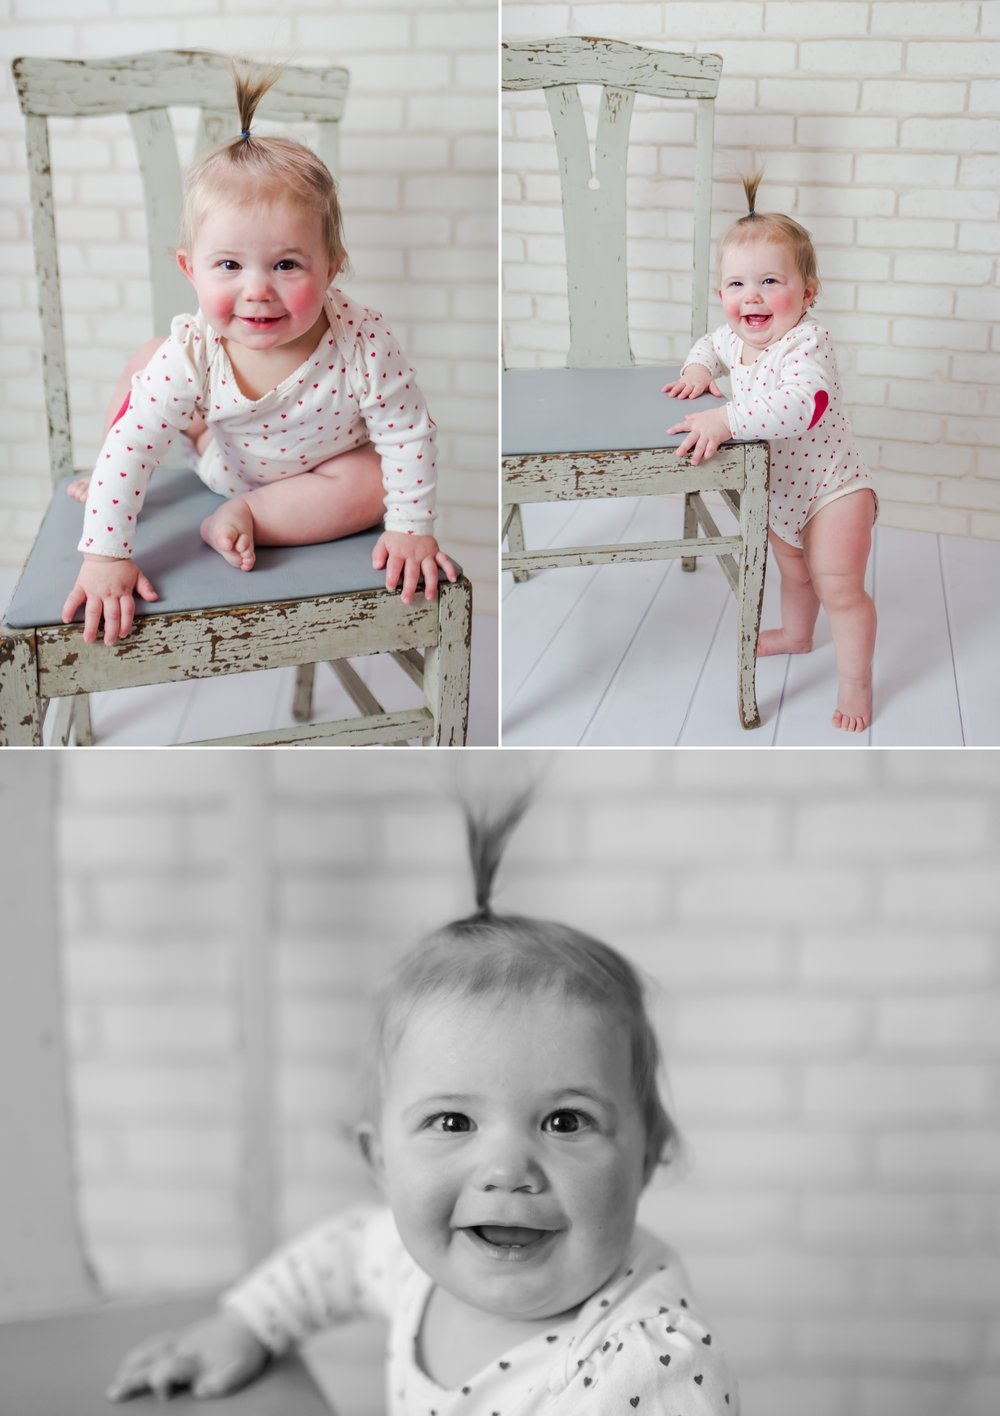 12_month_birthday_photography_cake_smash_girl_portraits_photo_props_ideas 2